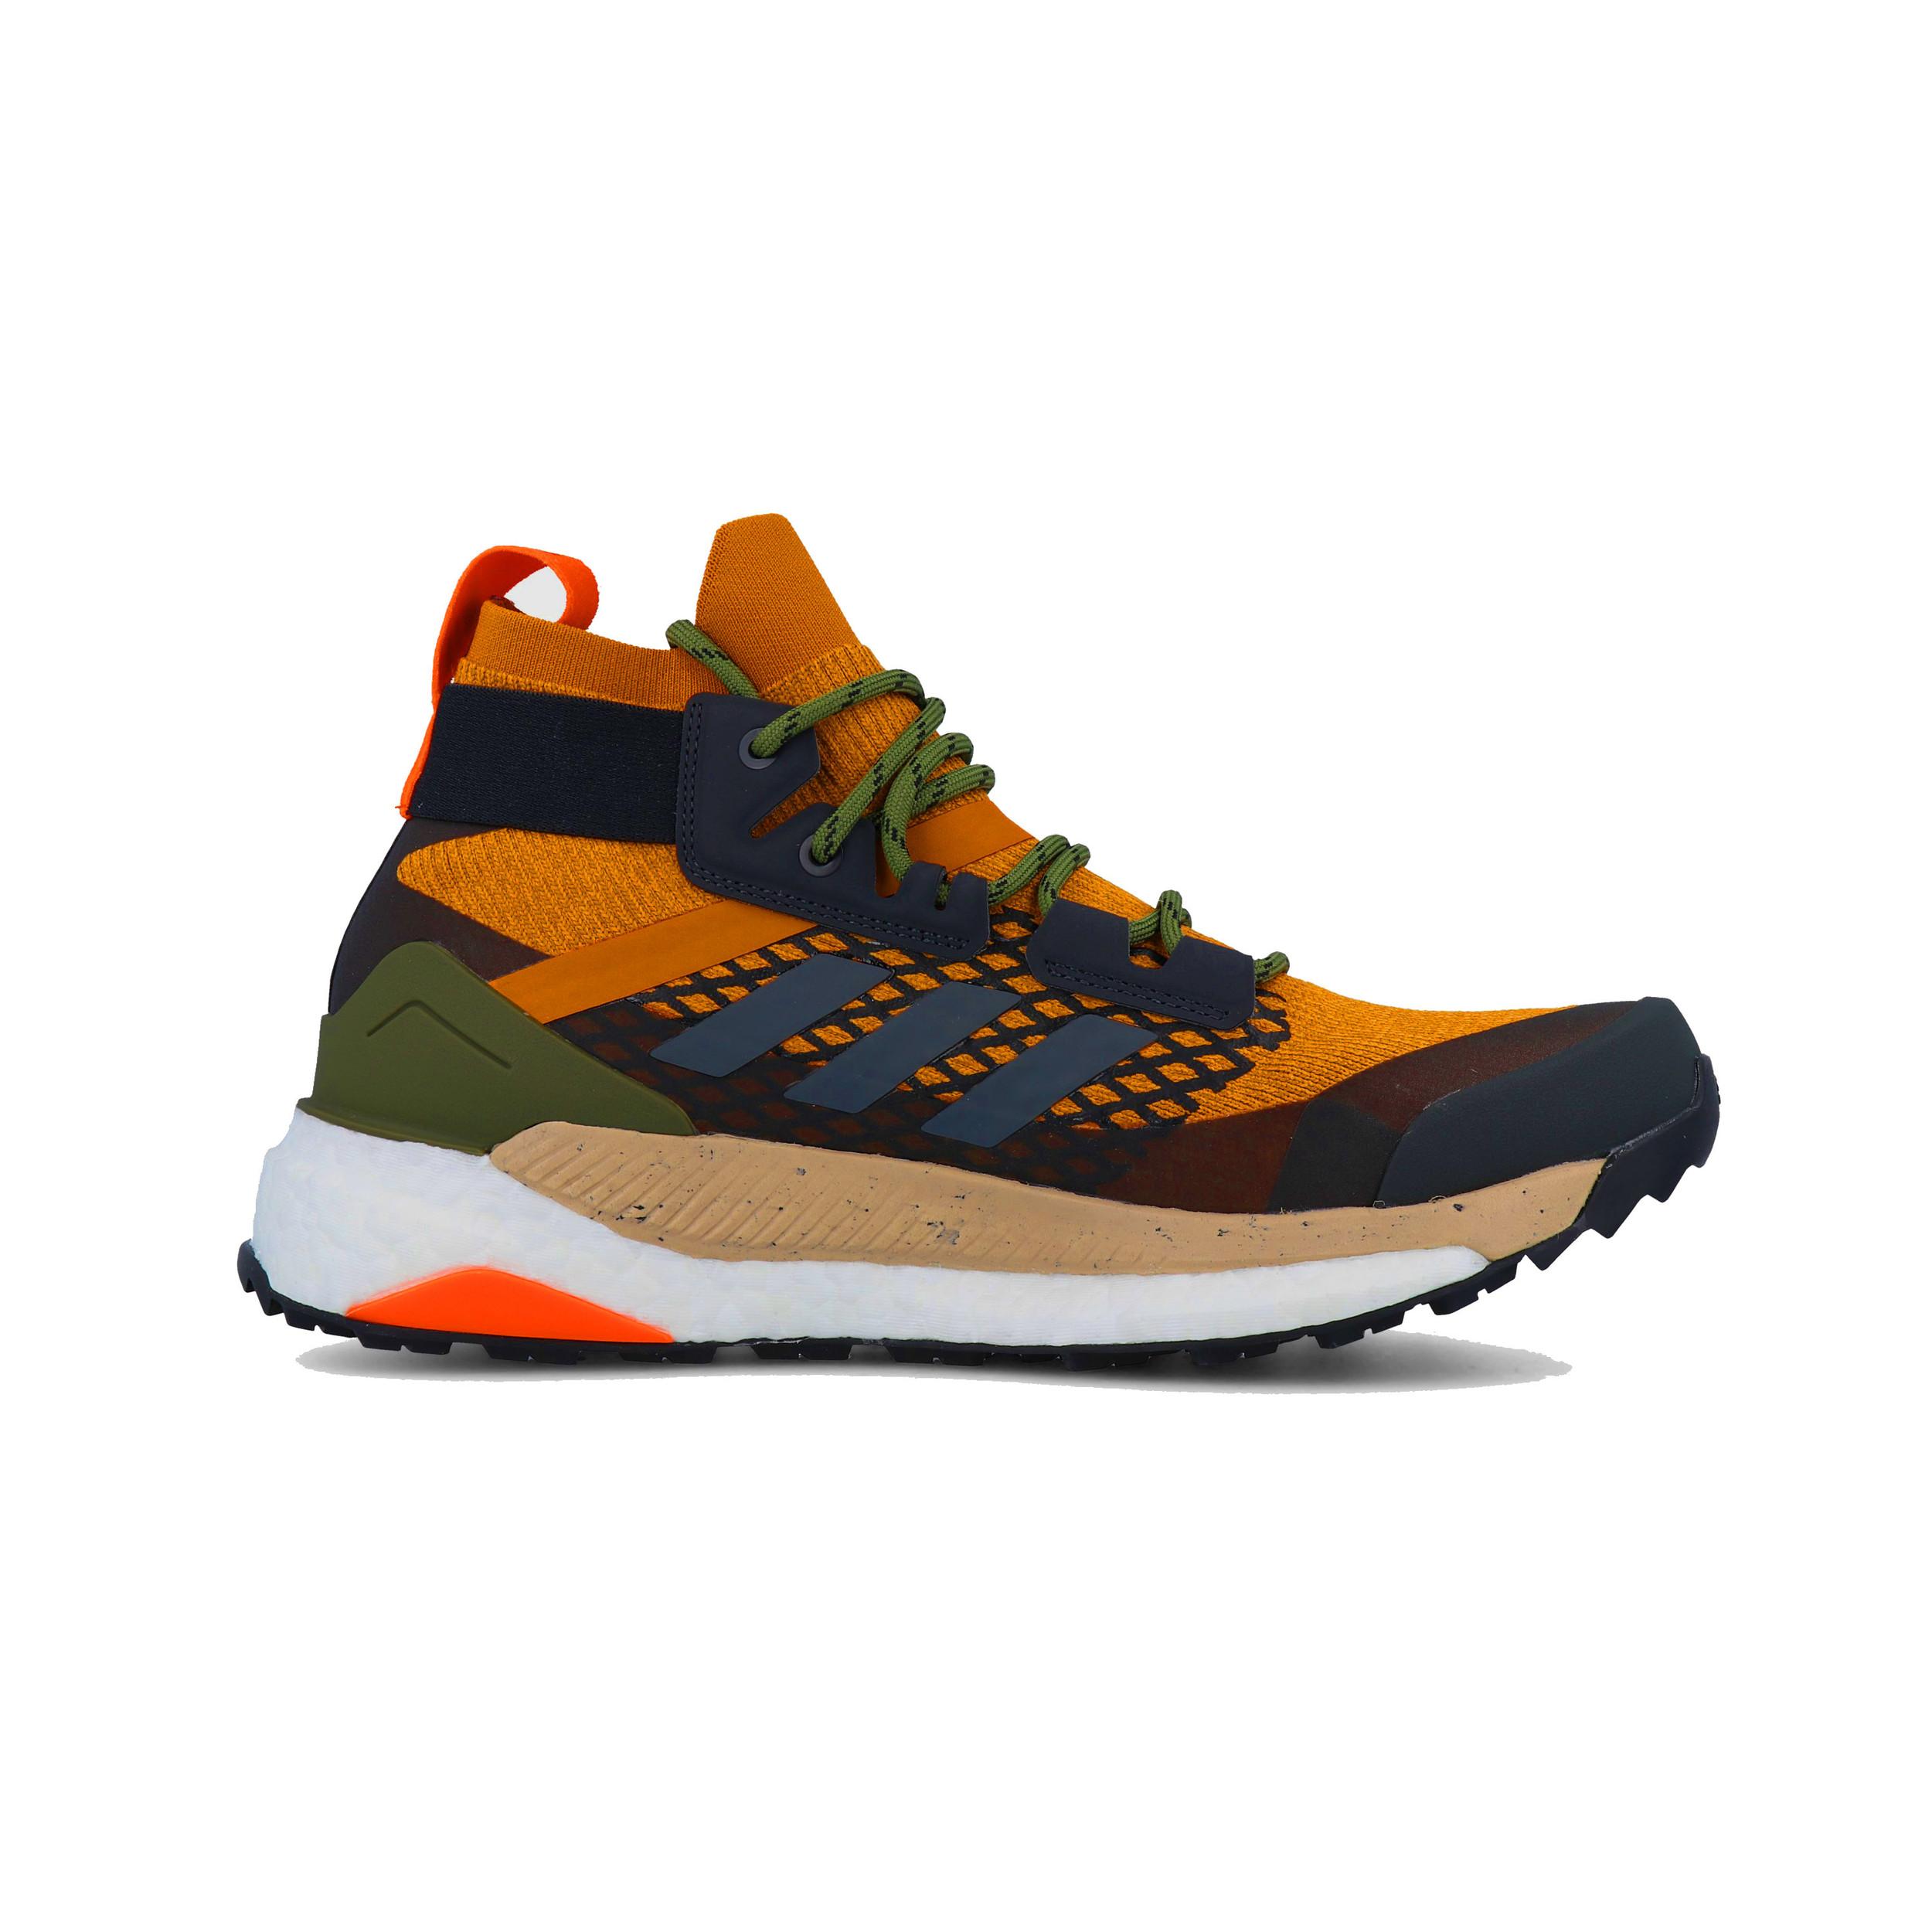 ef94f0c85c Details about adidas Mens Terrex Free Hiker Walking Shoes Black Orange  Sports Outdoors Water